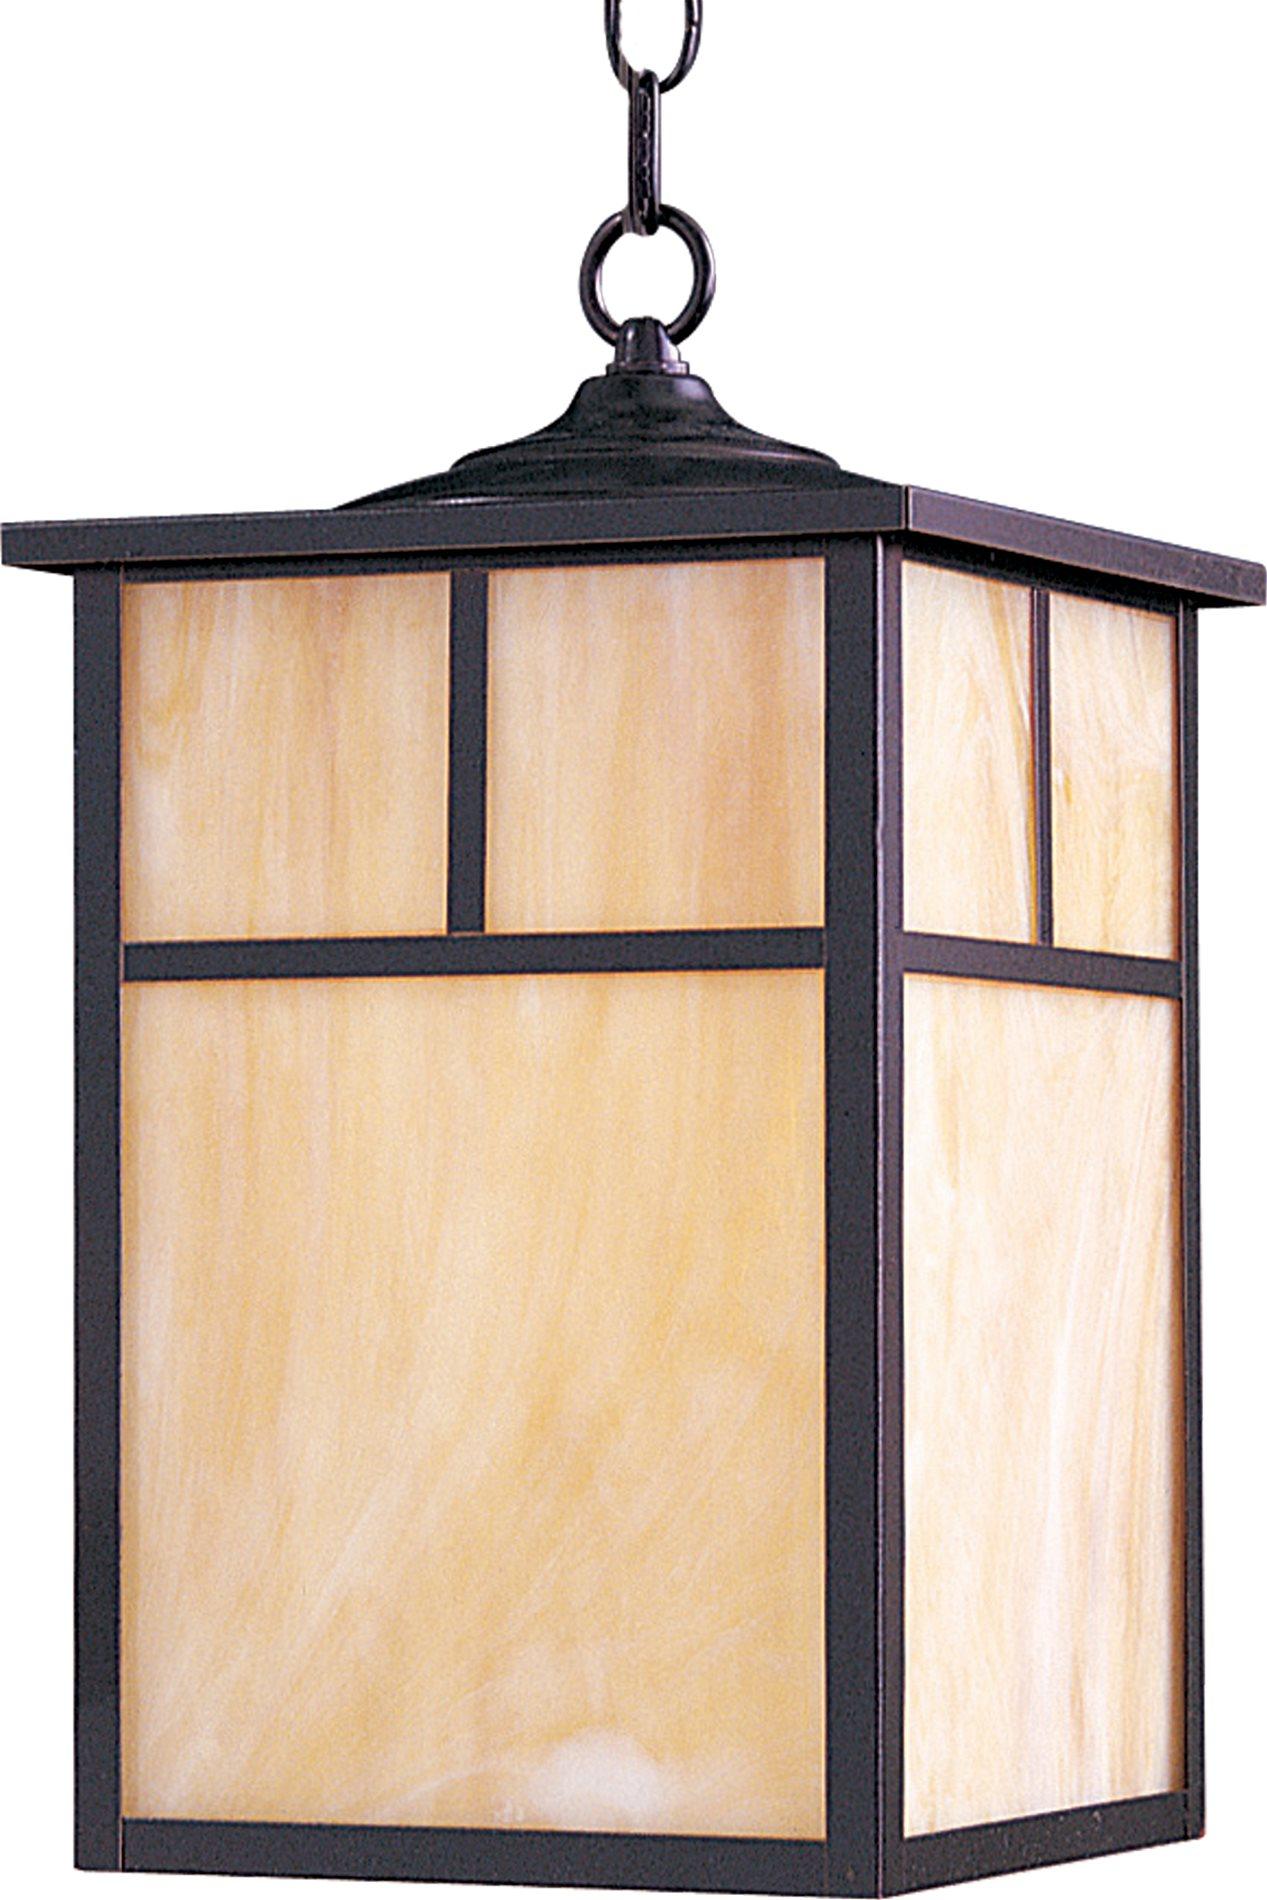 Maxim Lighting 4058HOBU Craftsman Transitional Outdoor